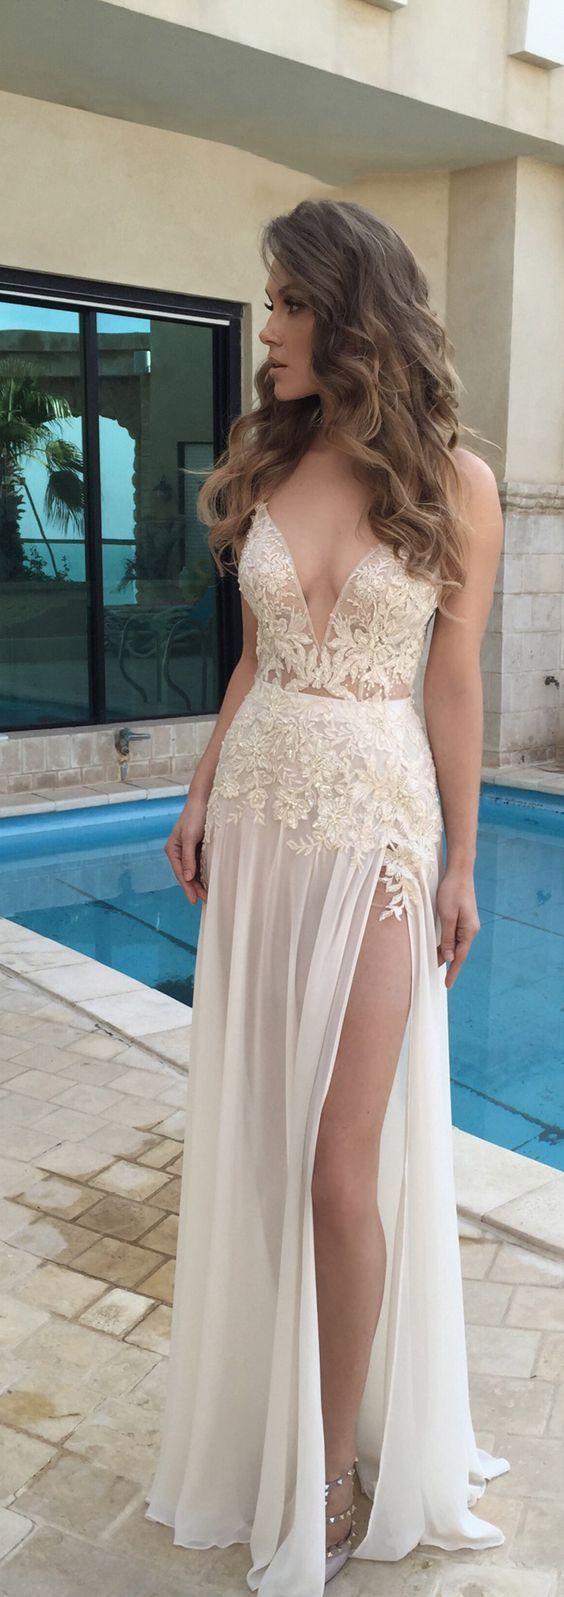 Deep vneck long prom dress applique sleeveless evening dress with